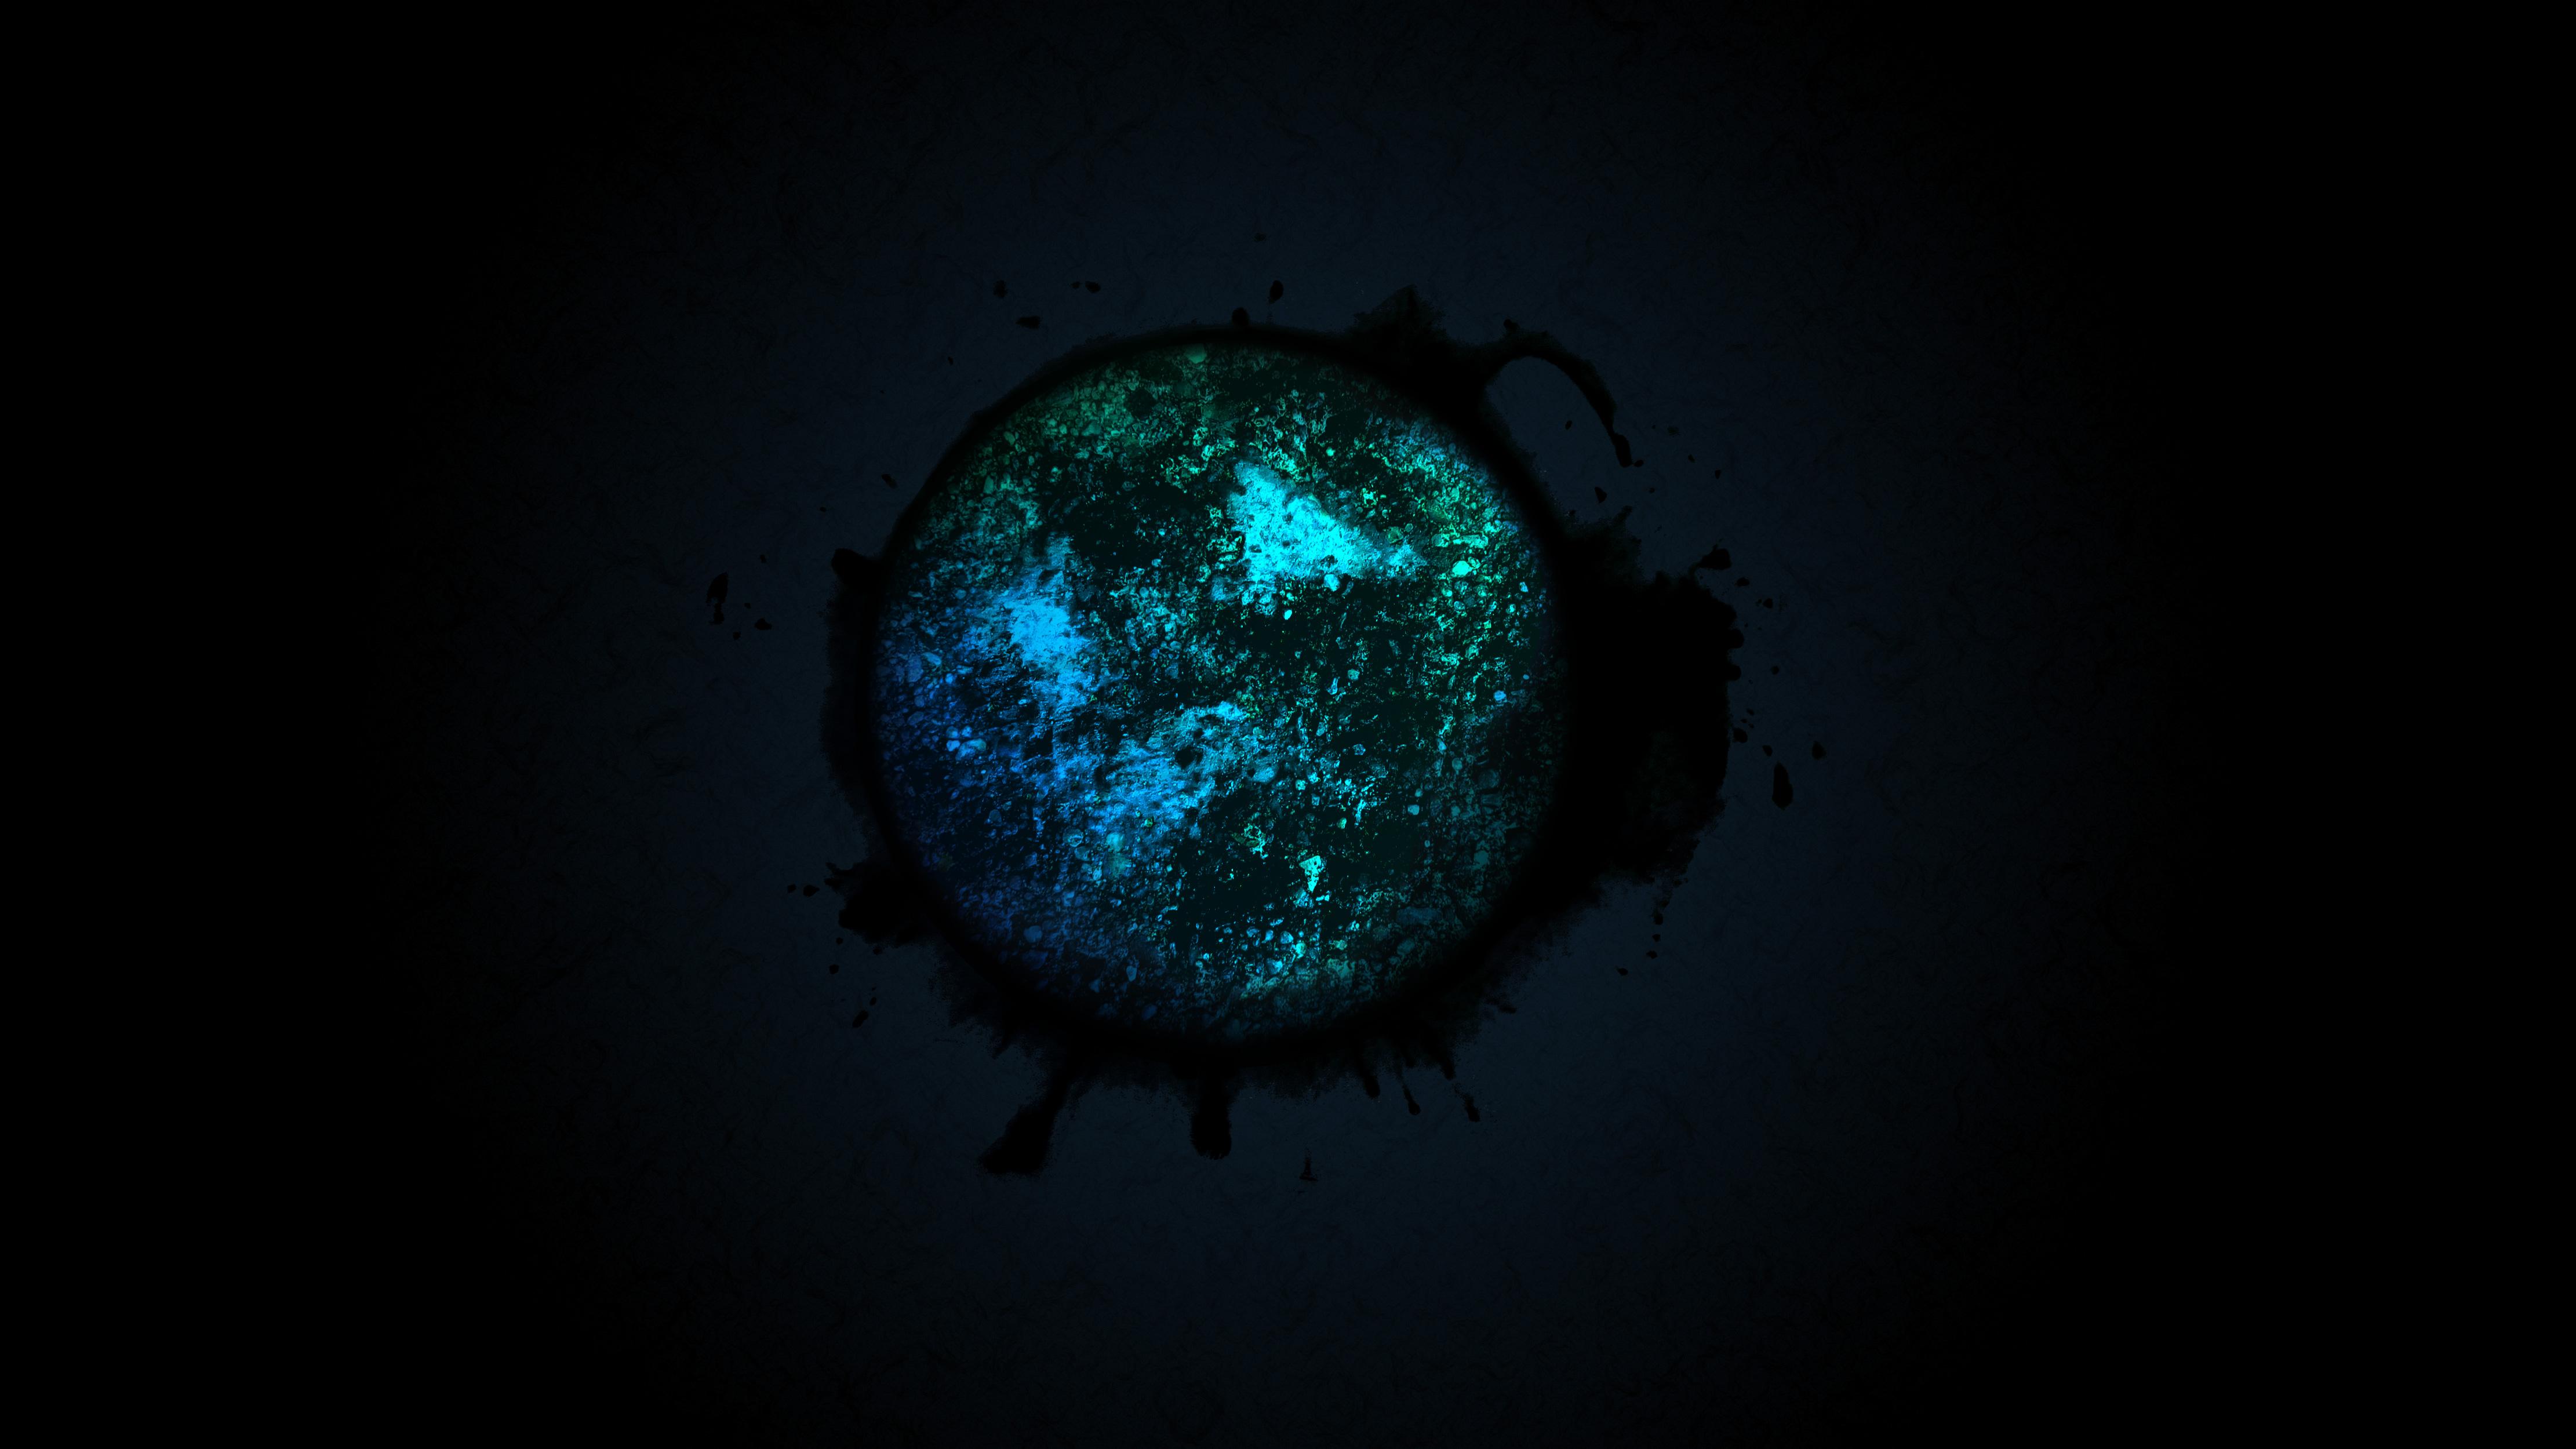 Wallpaper Black hole Universe Stars Black HD Space